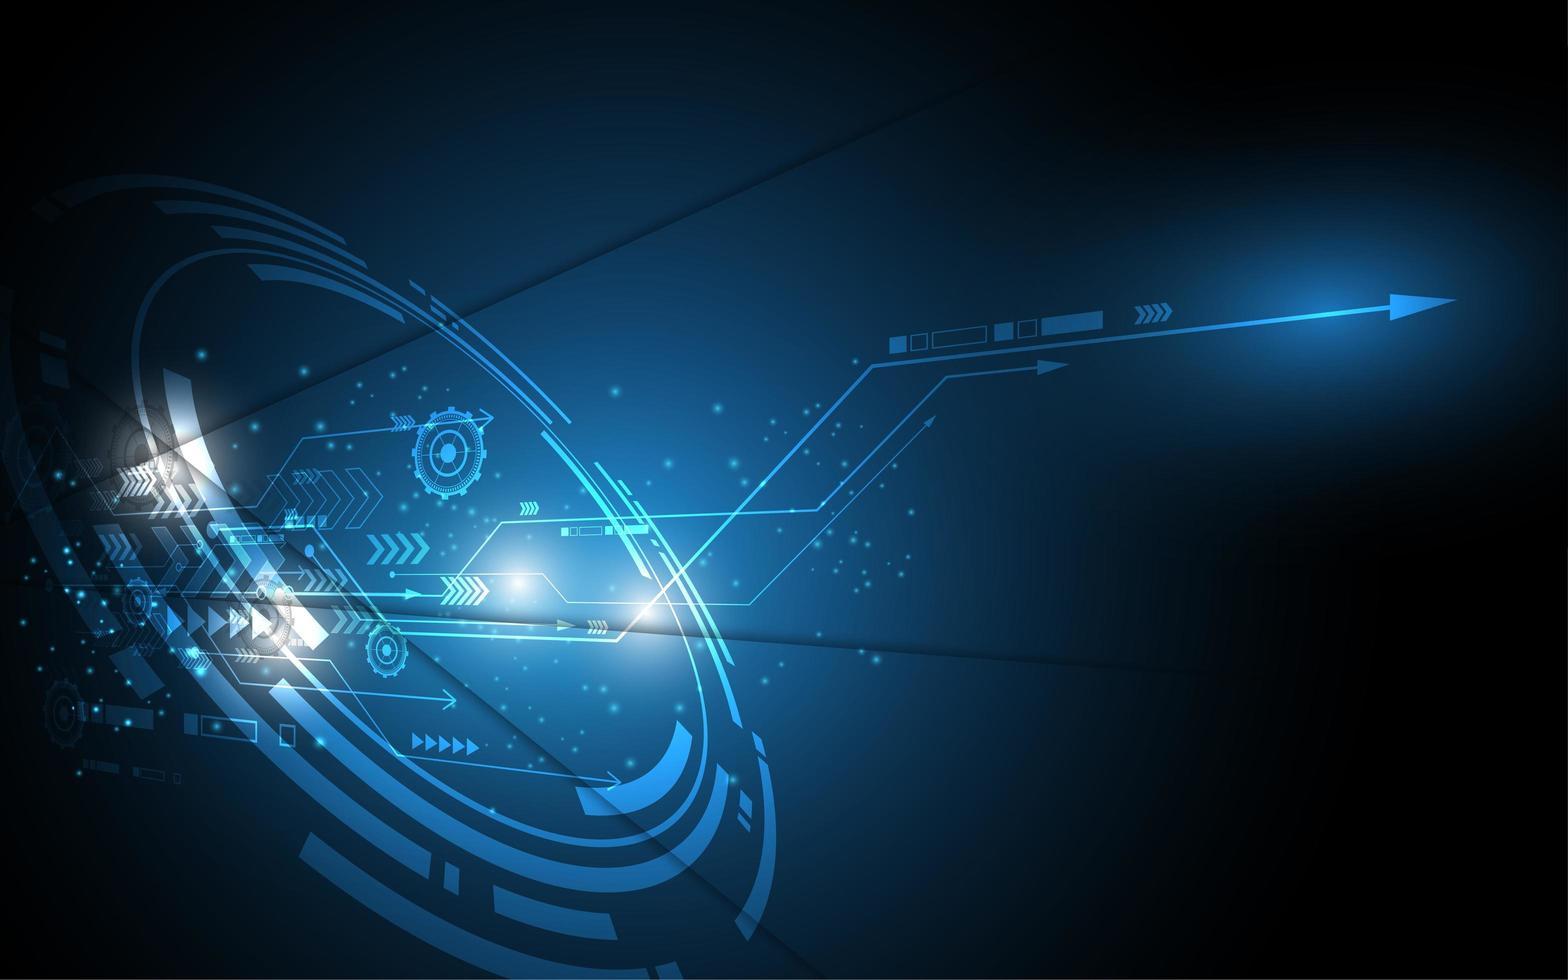 dunkles Hi-Tech-Design mit blau leuchtender Technologie vektor